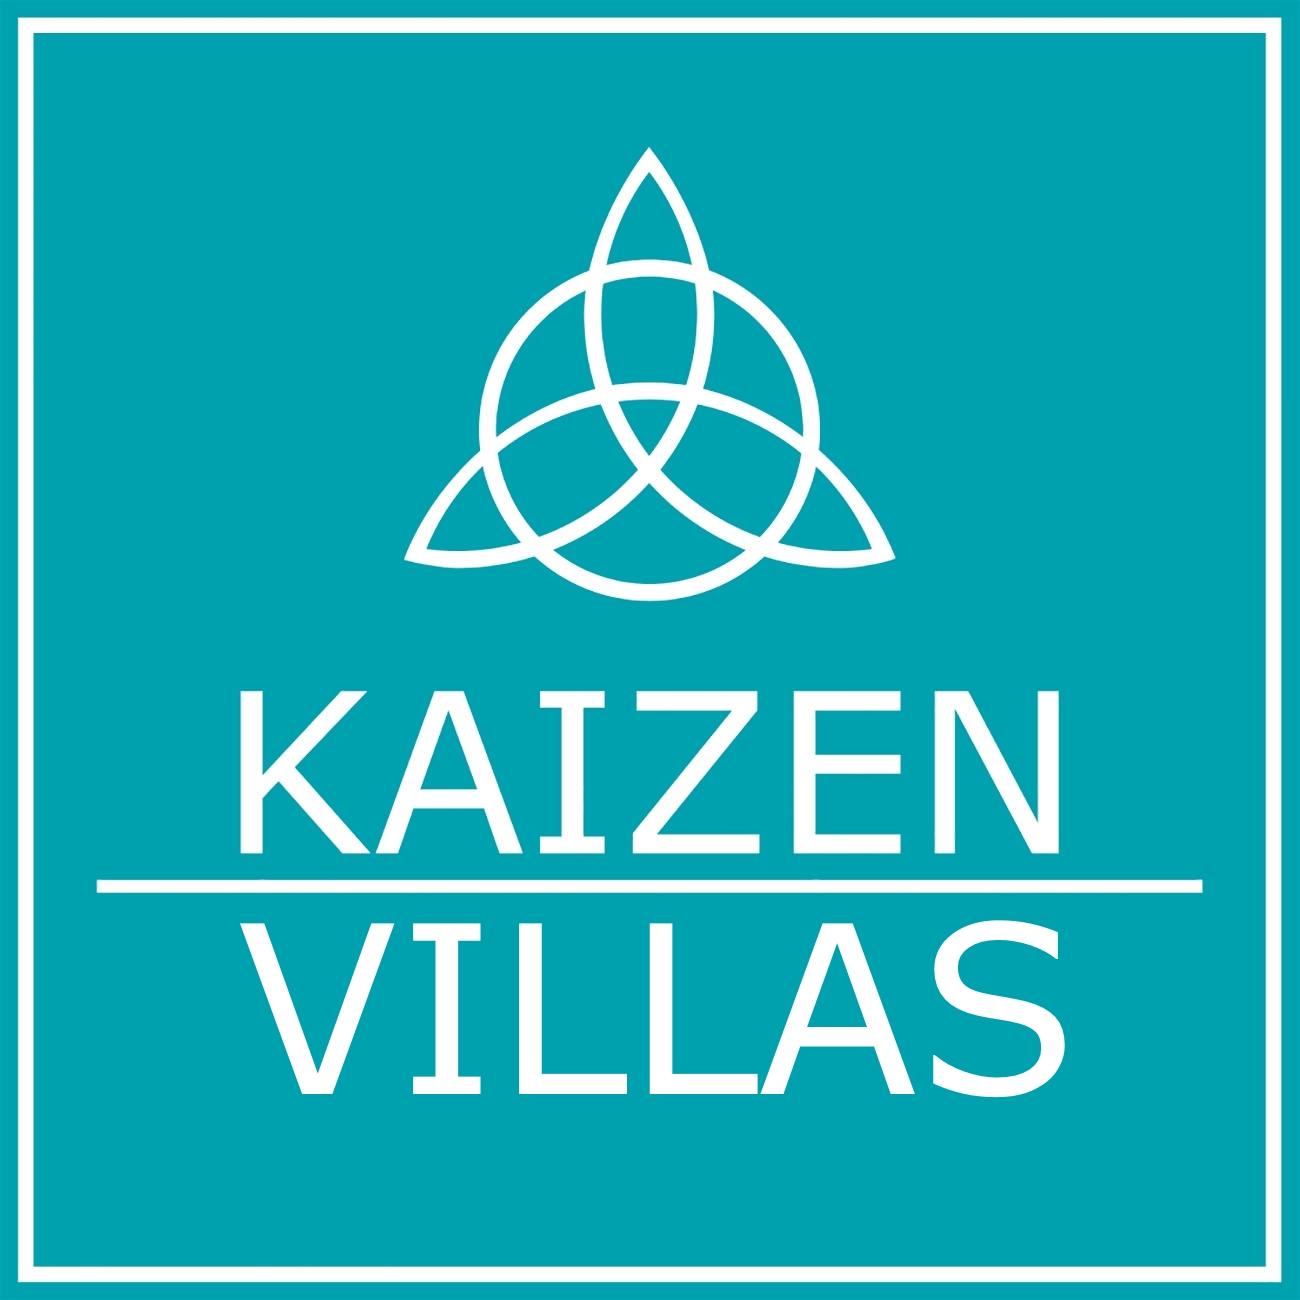 KAIZEN VILLAS